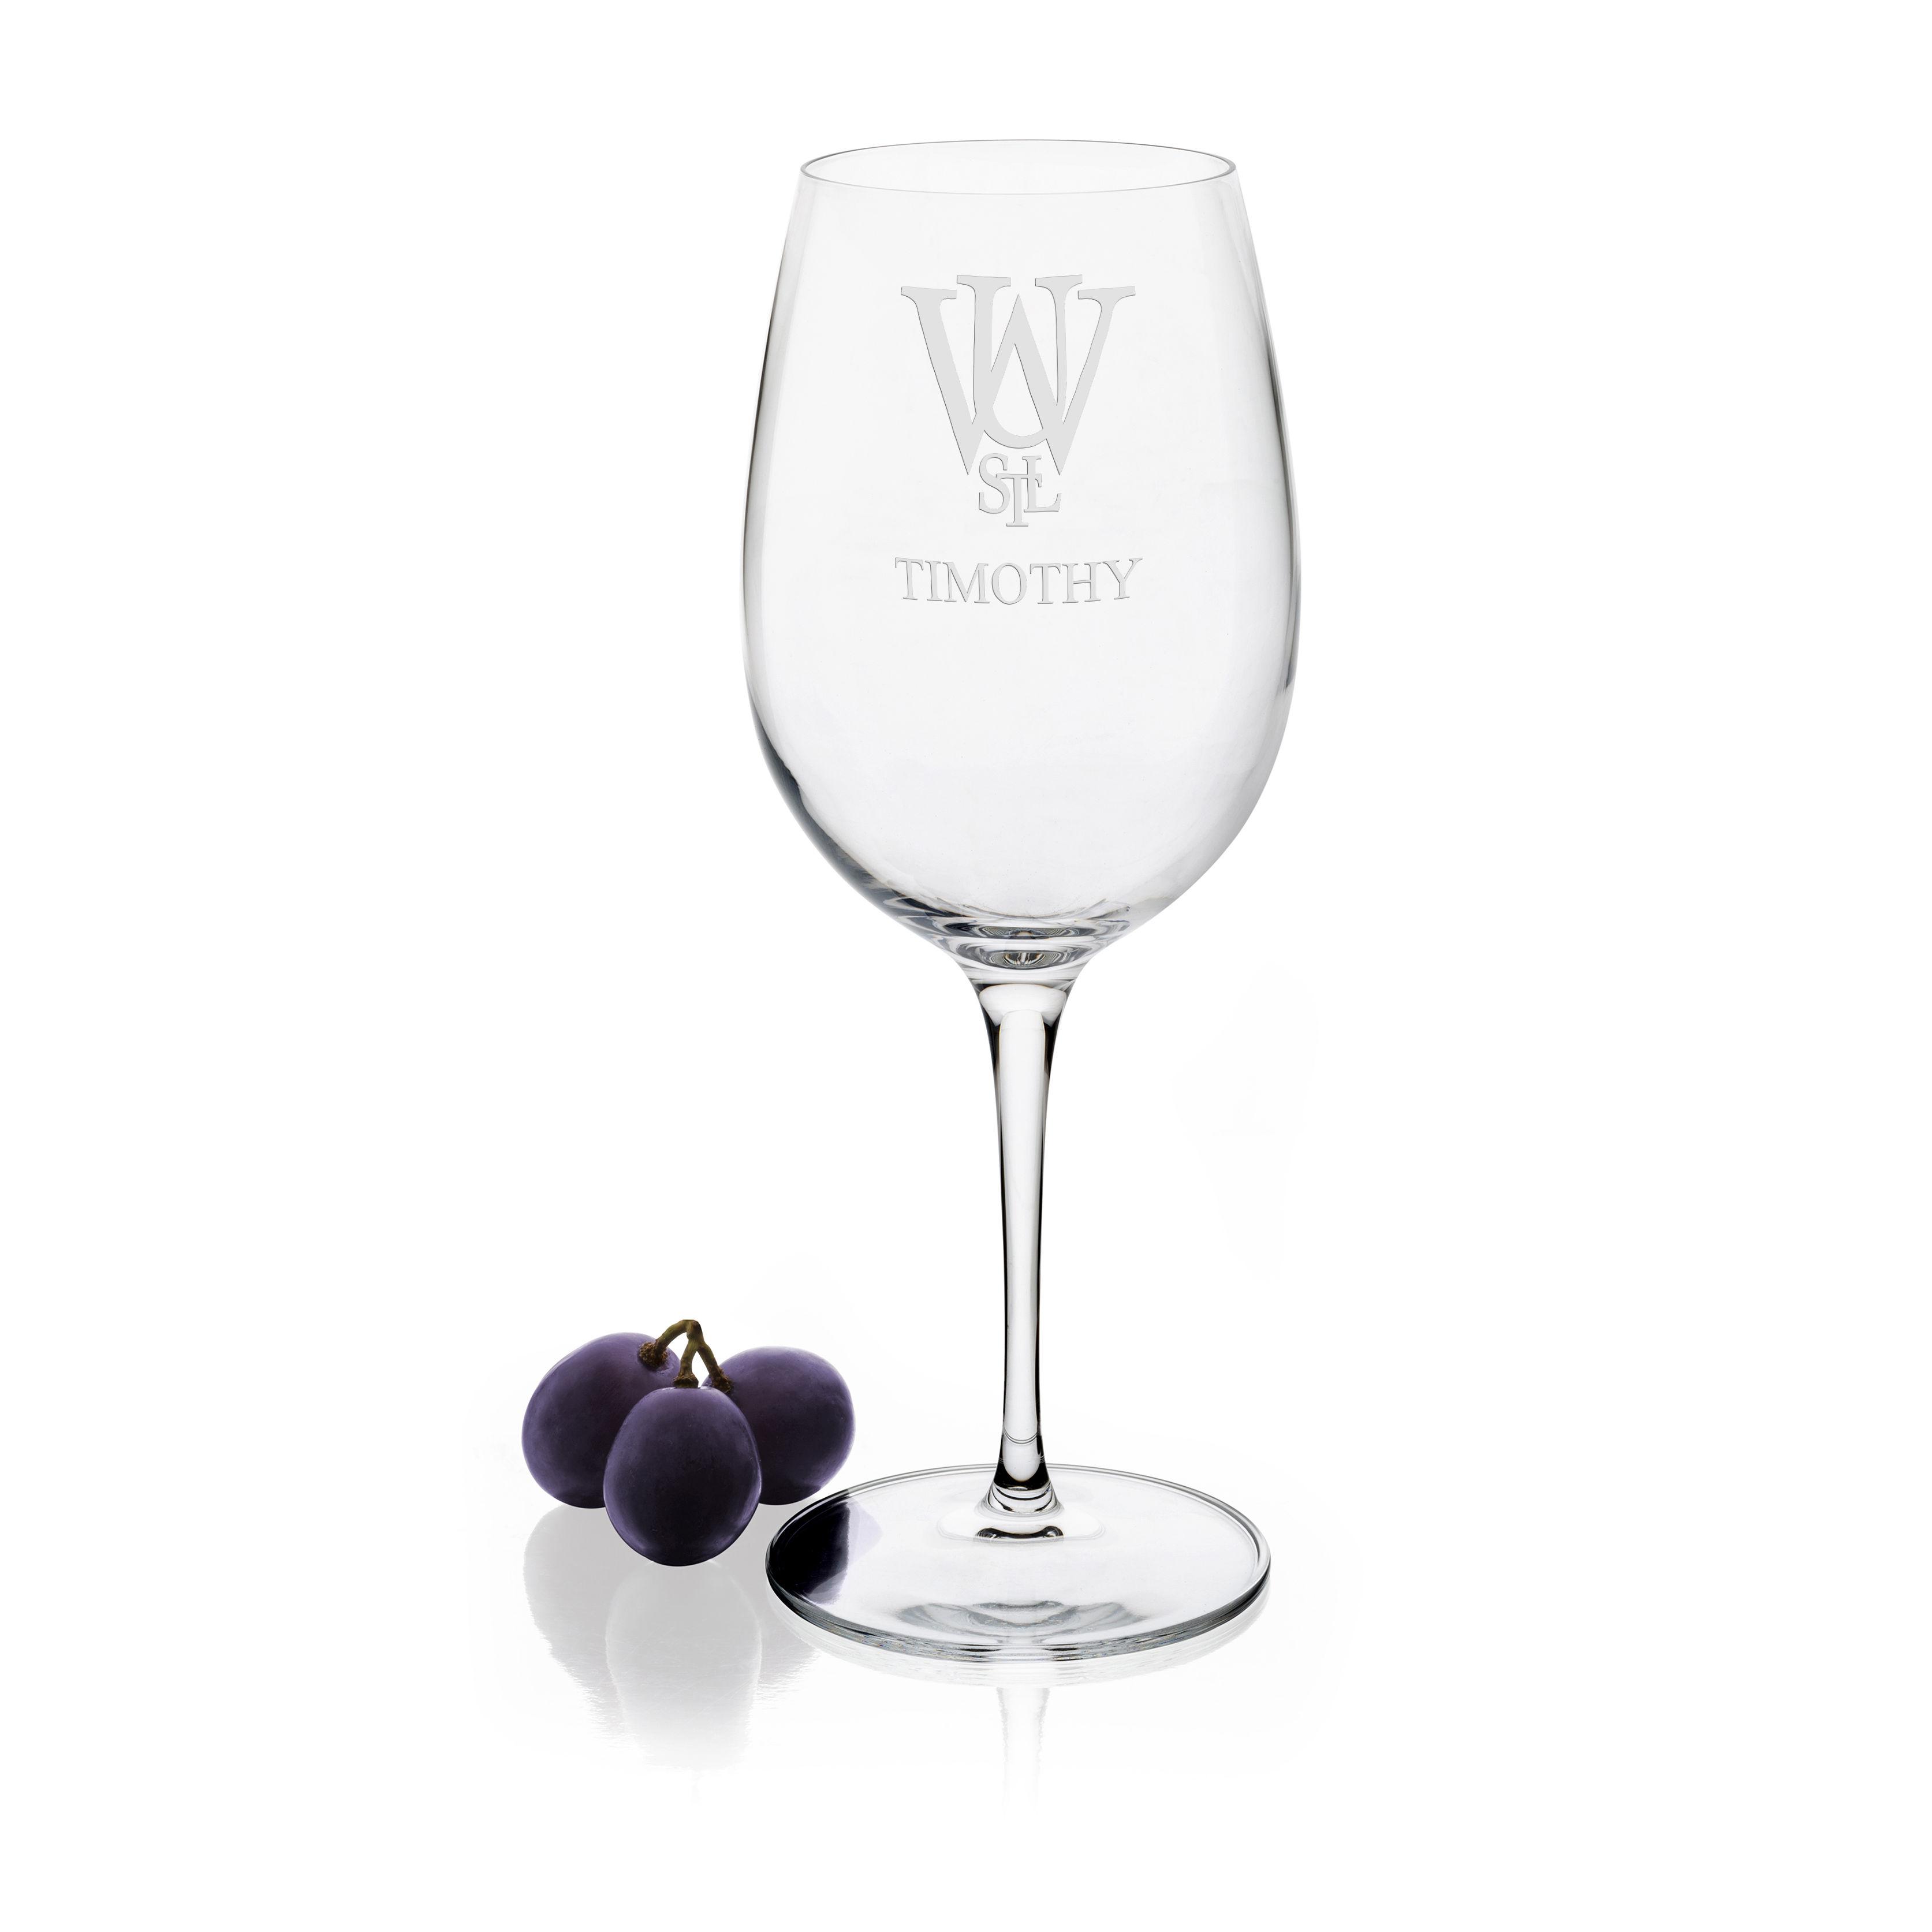 WUSTL Red Wine Glasses - Set of 4